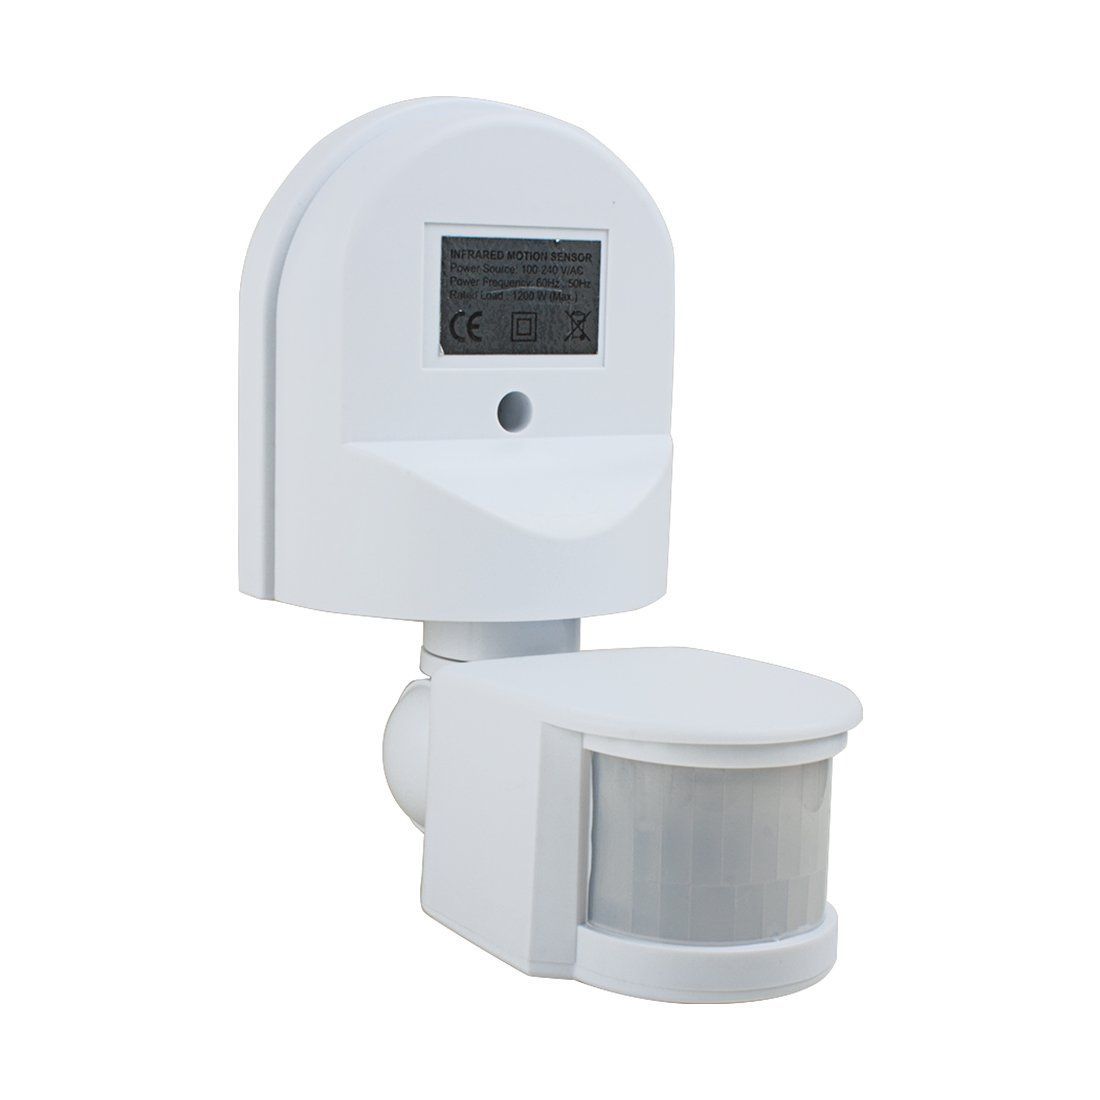 Uxcell Motion Sensor Switch AC 110V 240V Outdoor Adjustable Infrared Body  Motion PIR Sensor Detector · Light Switches